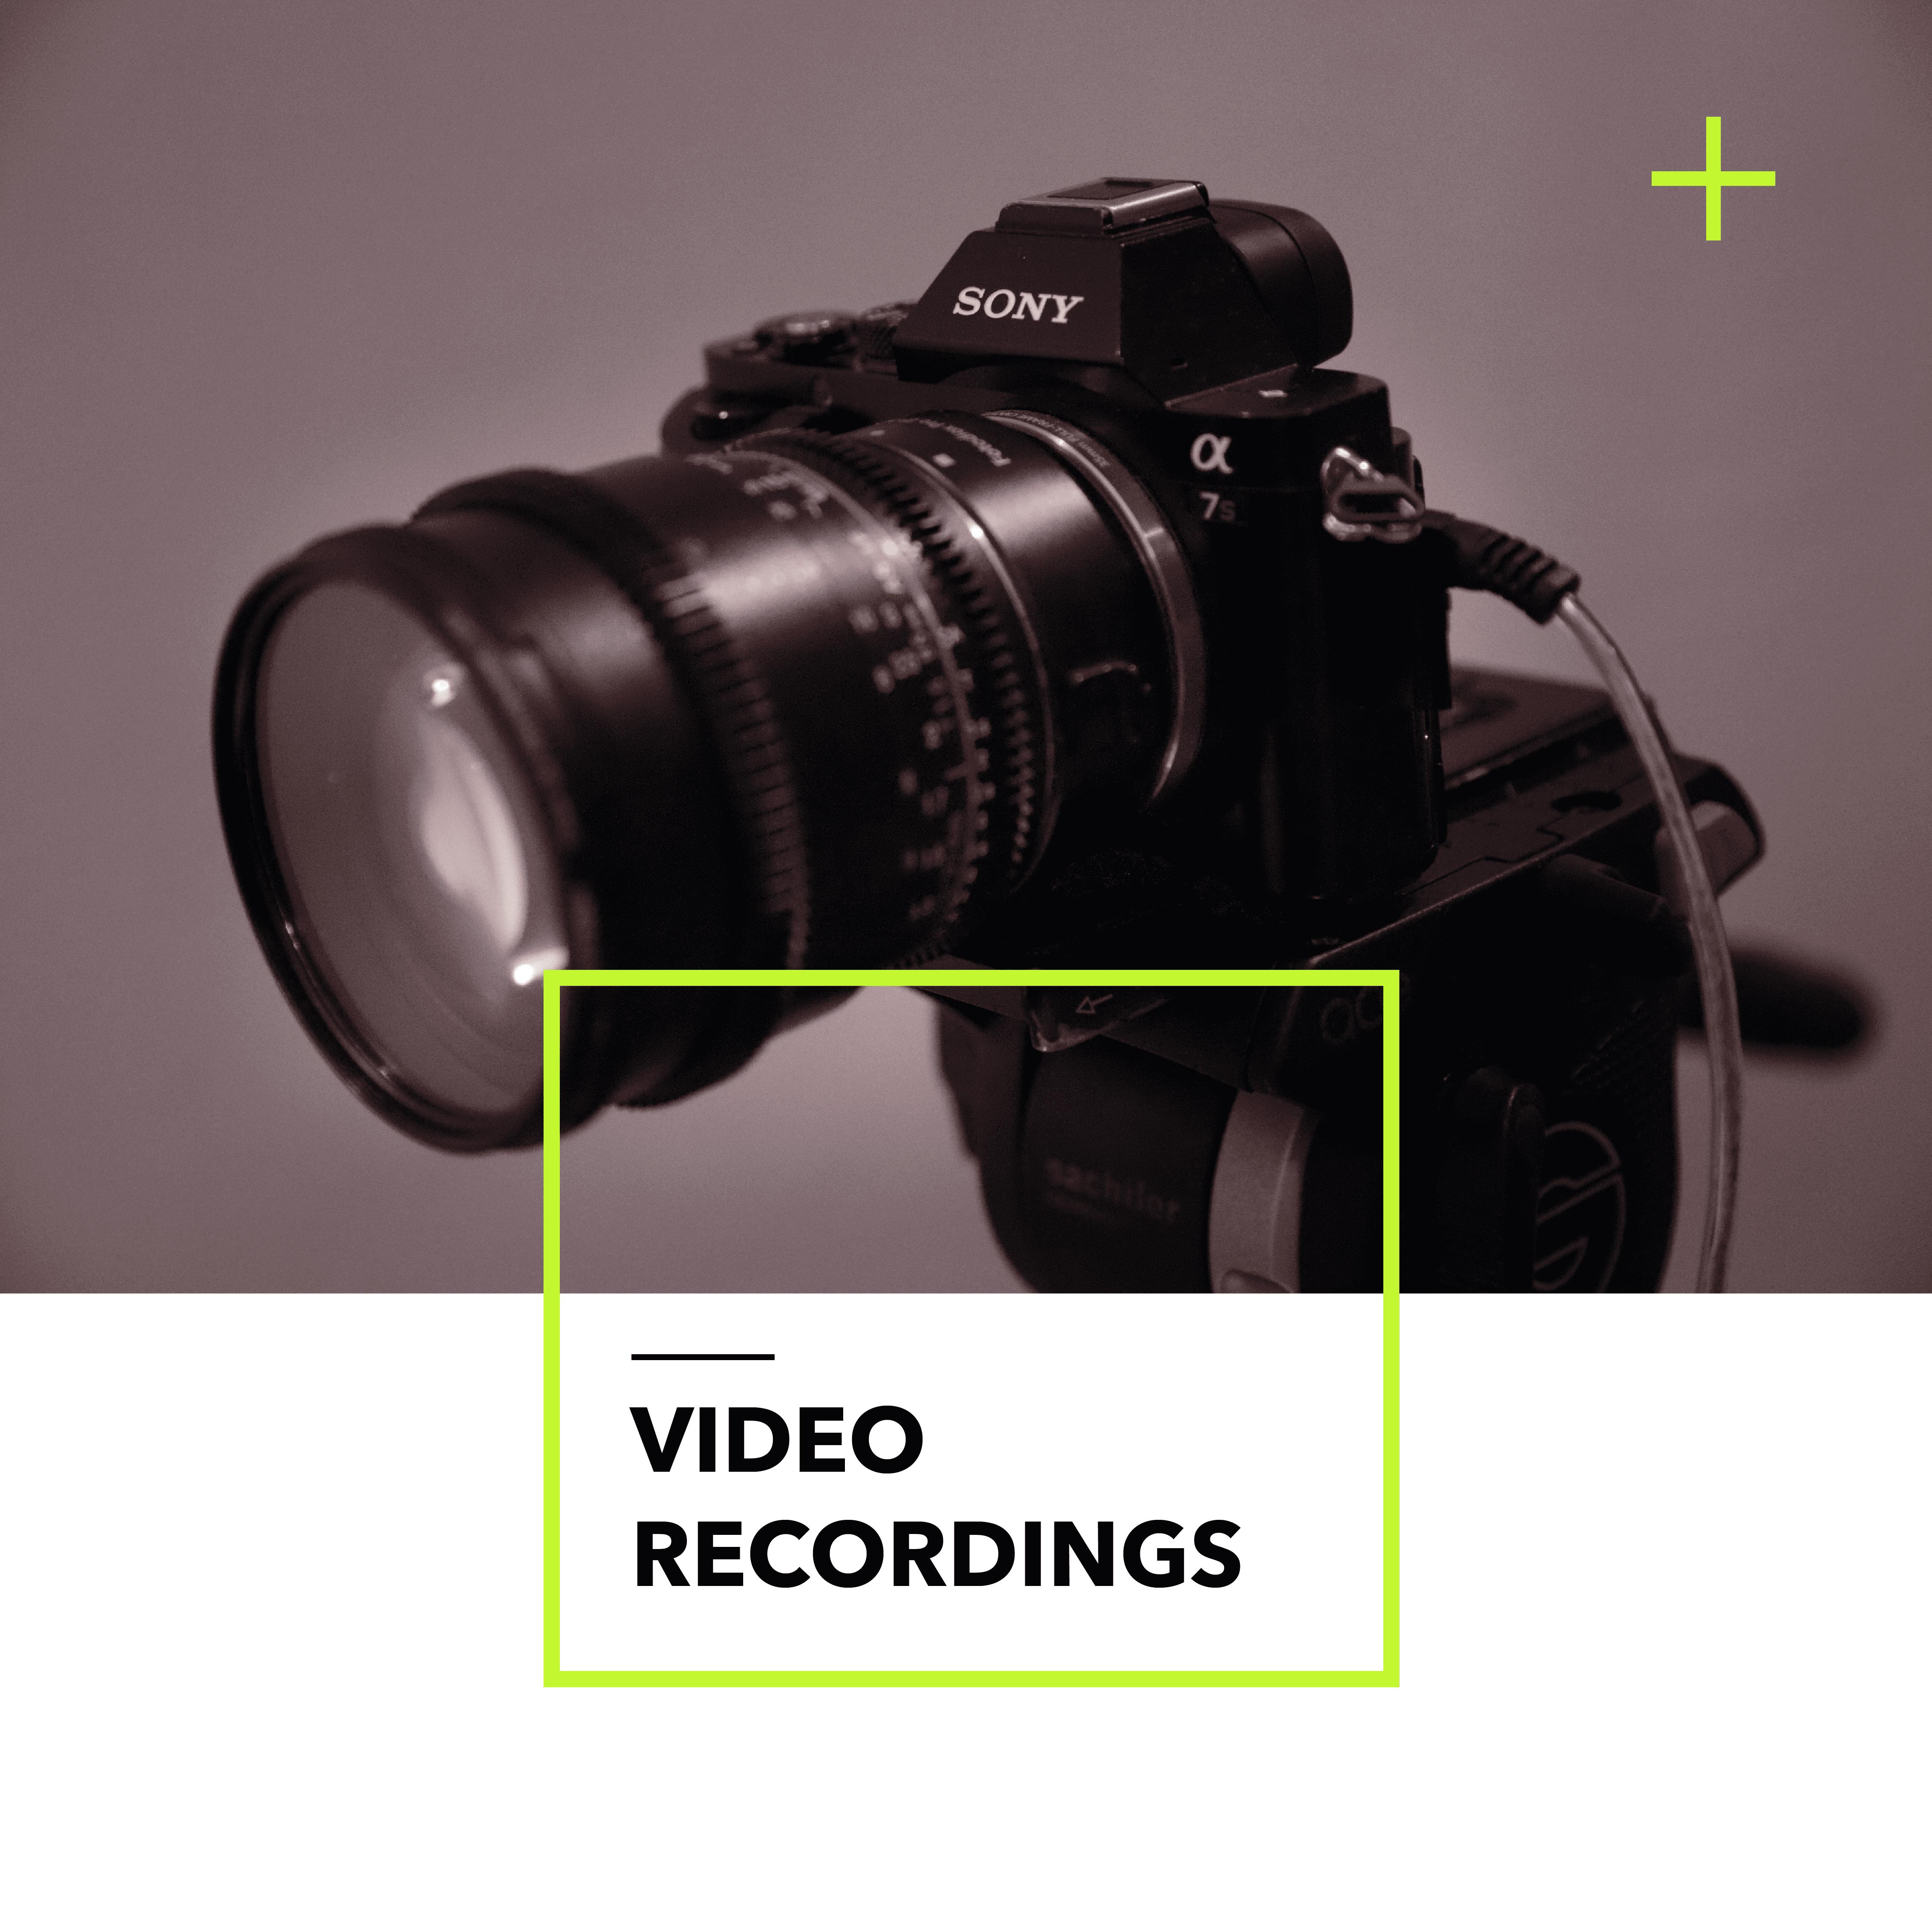 AMC WEBSITE - Content Specialties - Video Productions-01-2-2